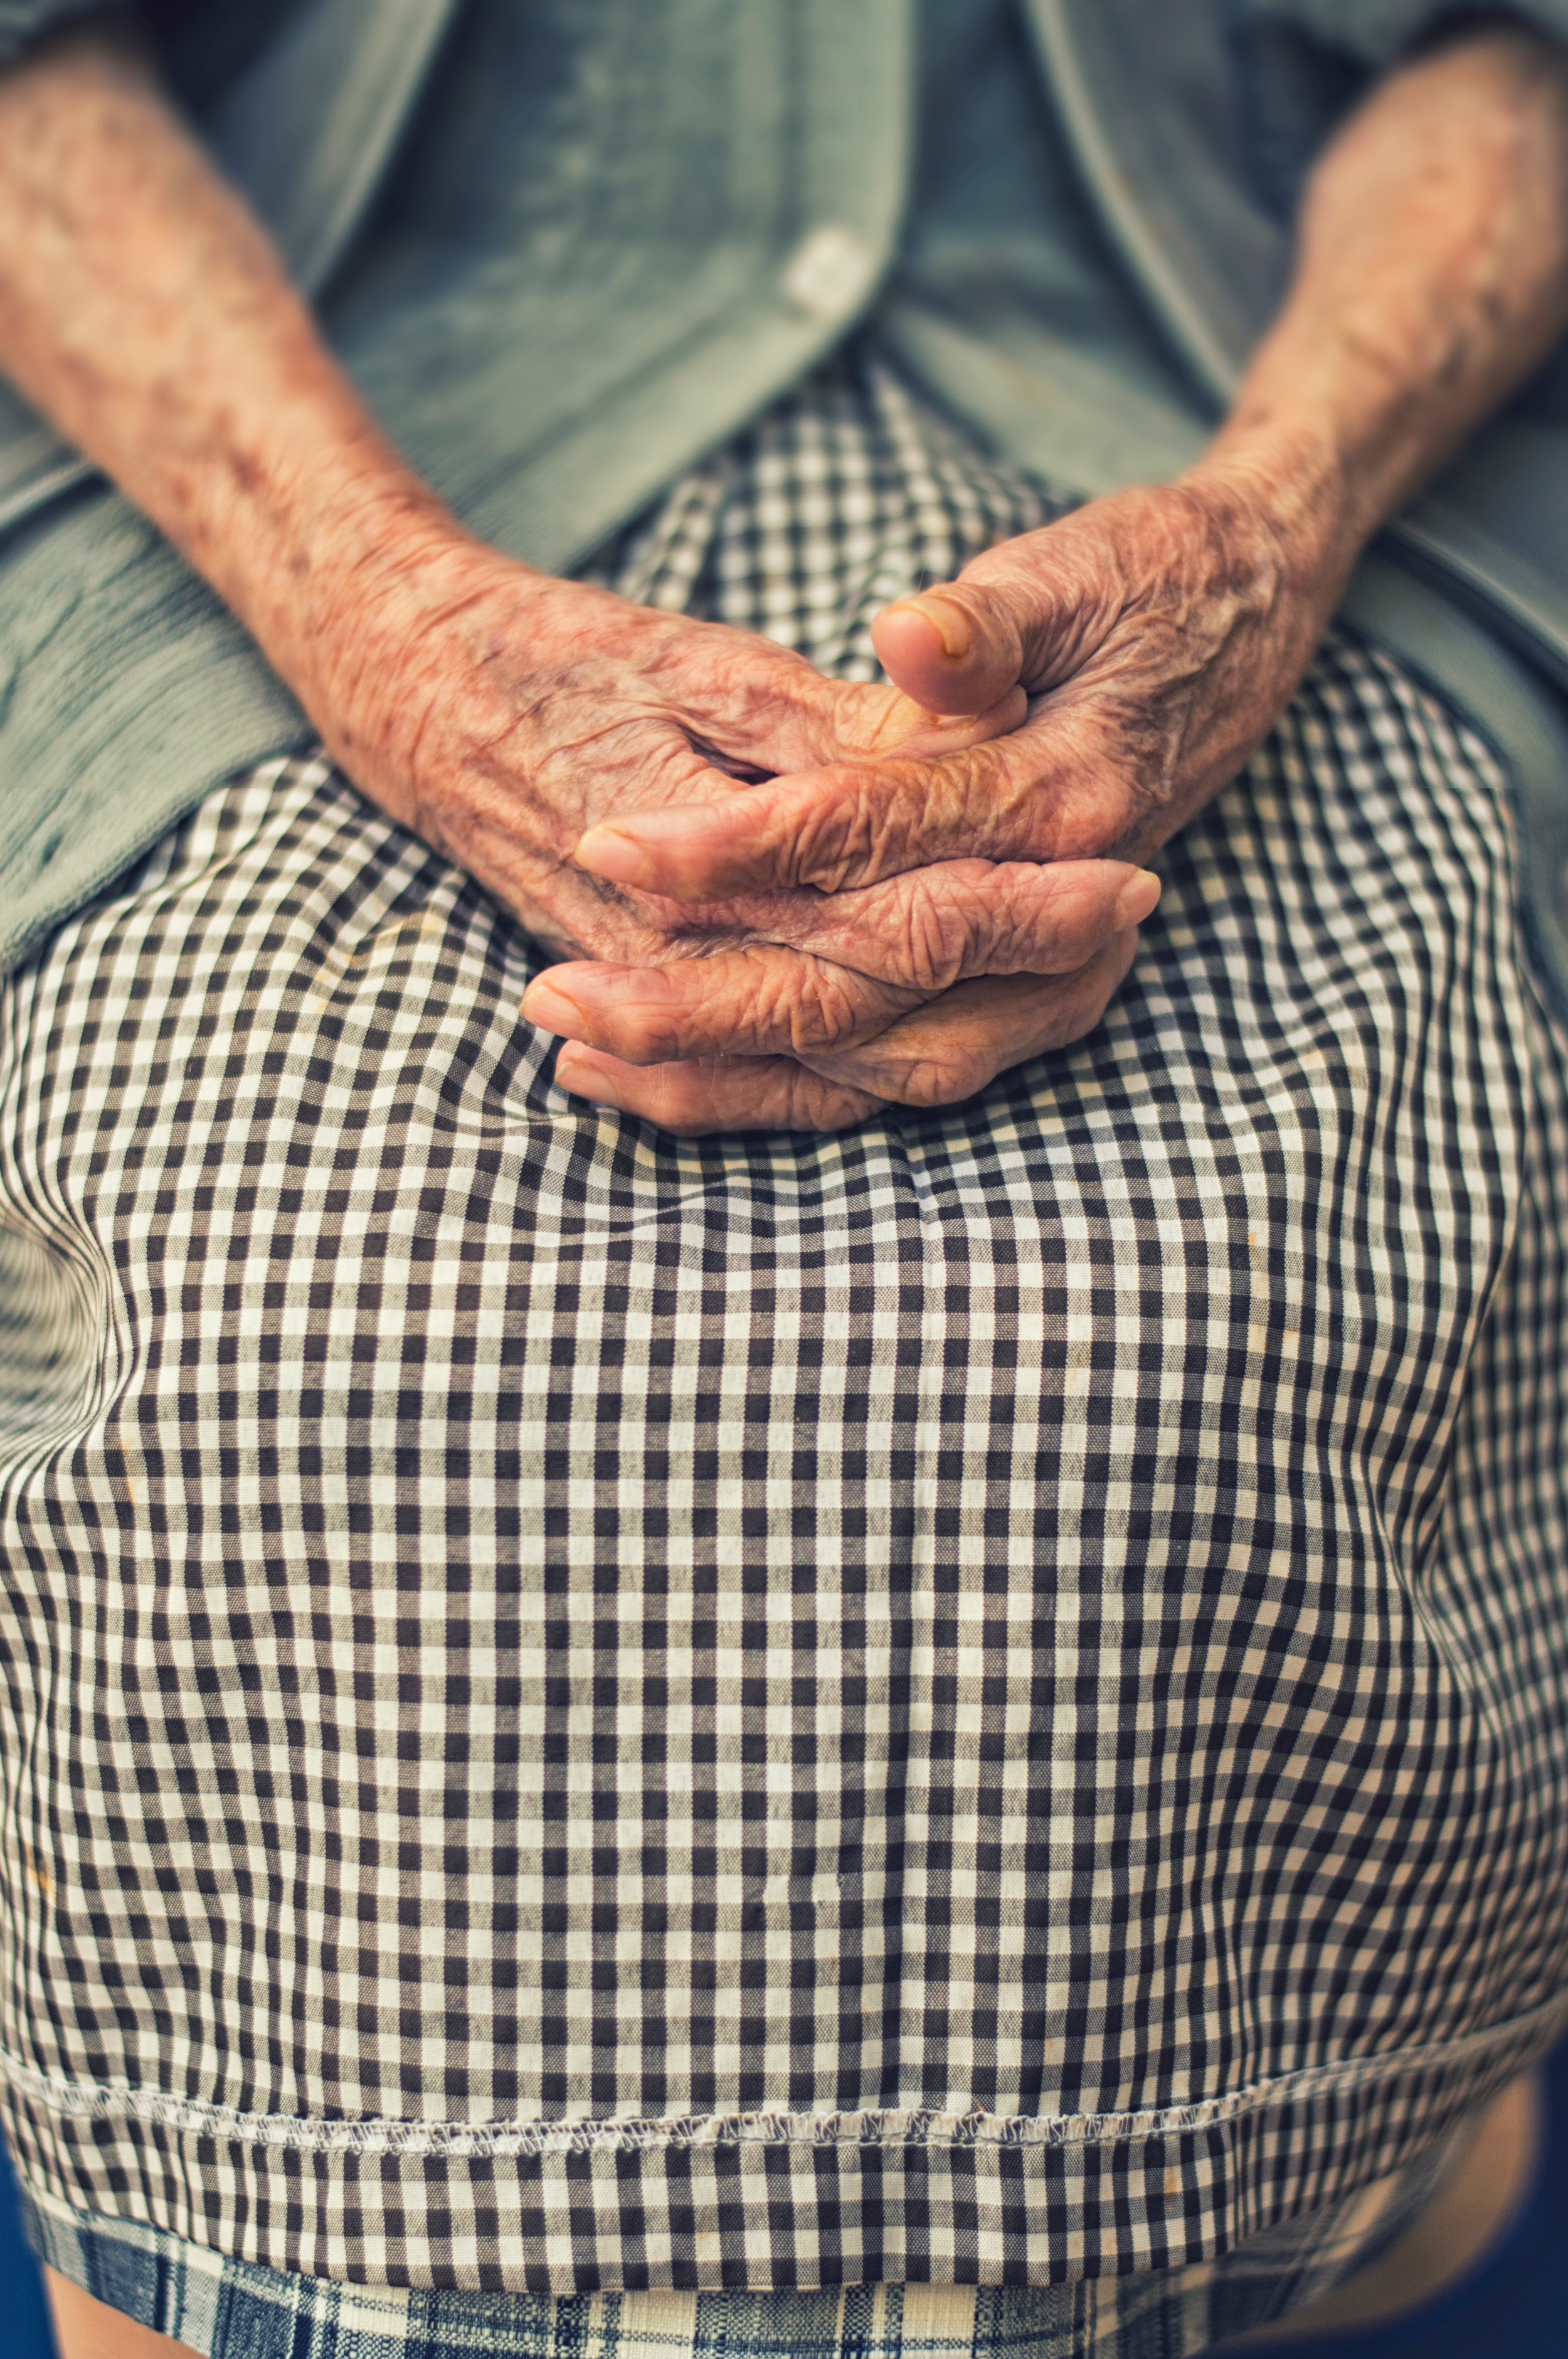 elderly woman hands.jpg